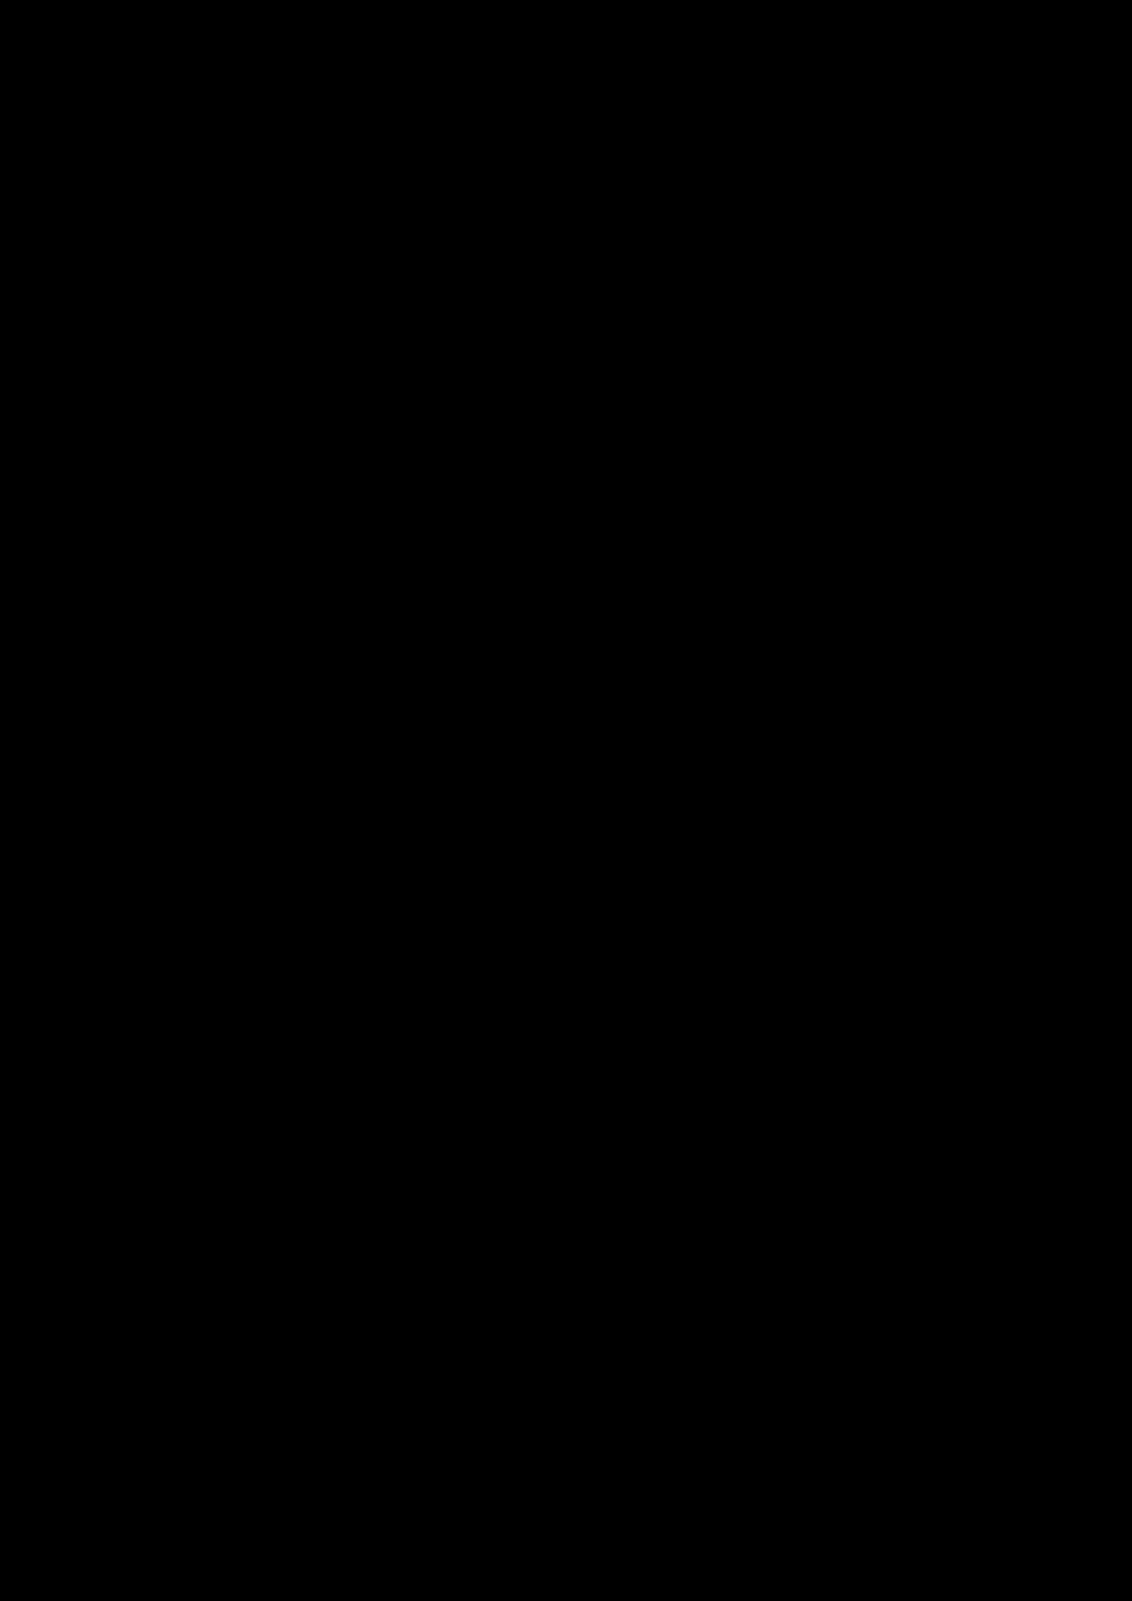 Belyiy sokol slide, Image 34